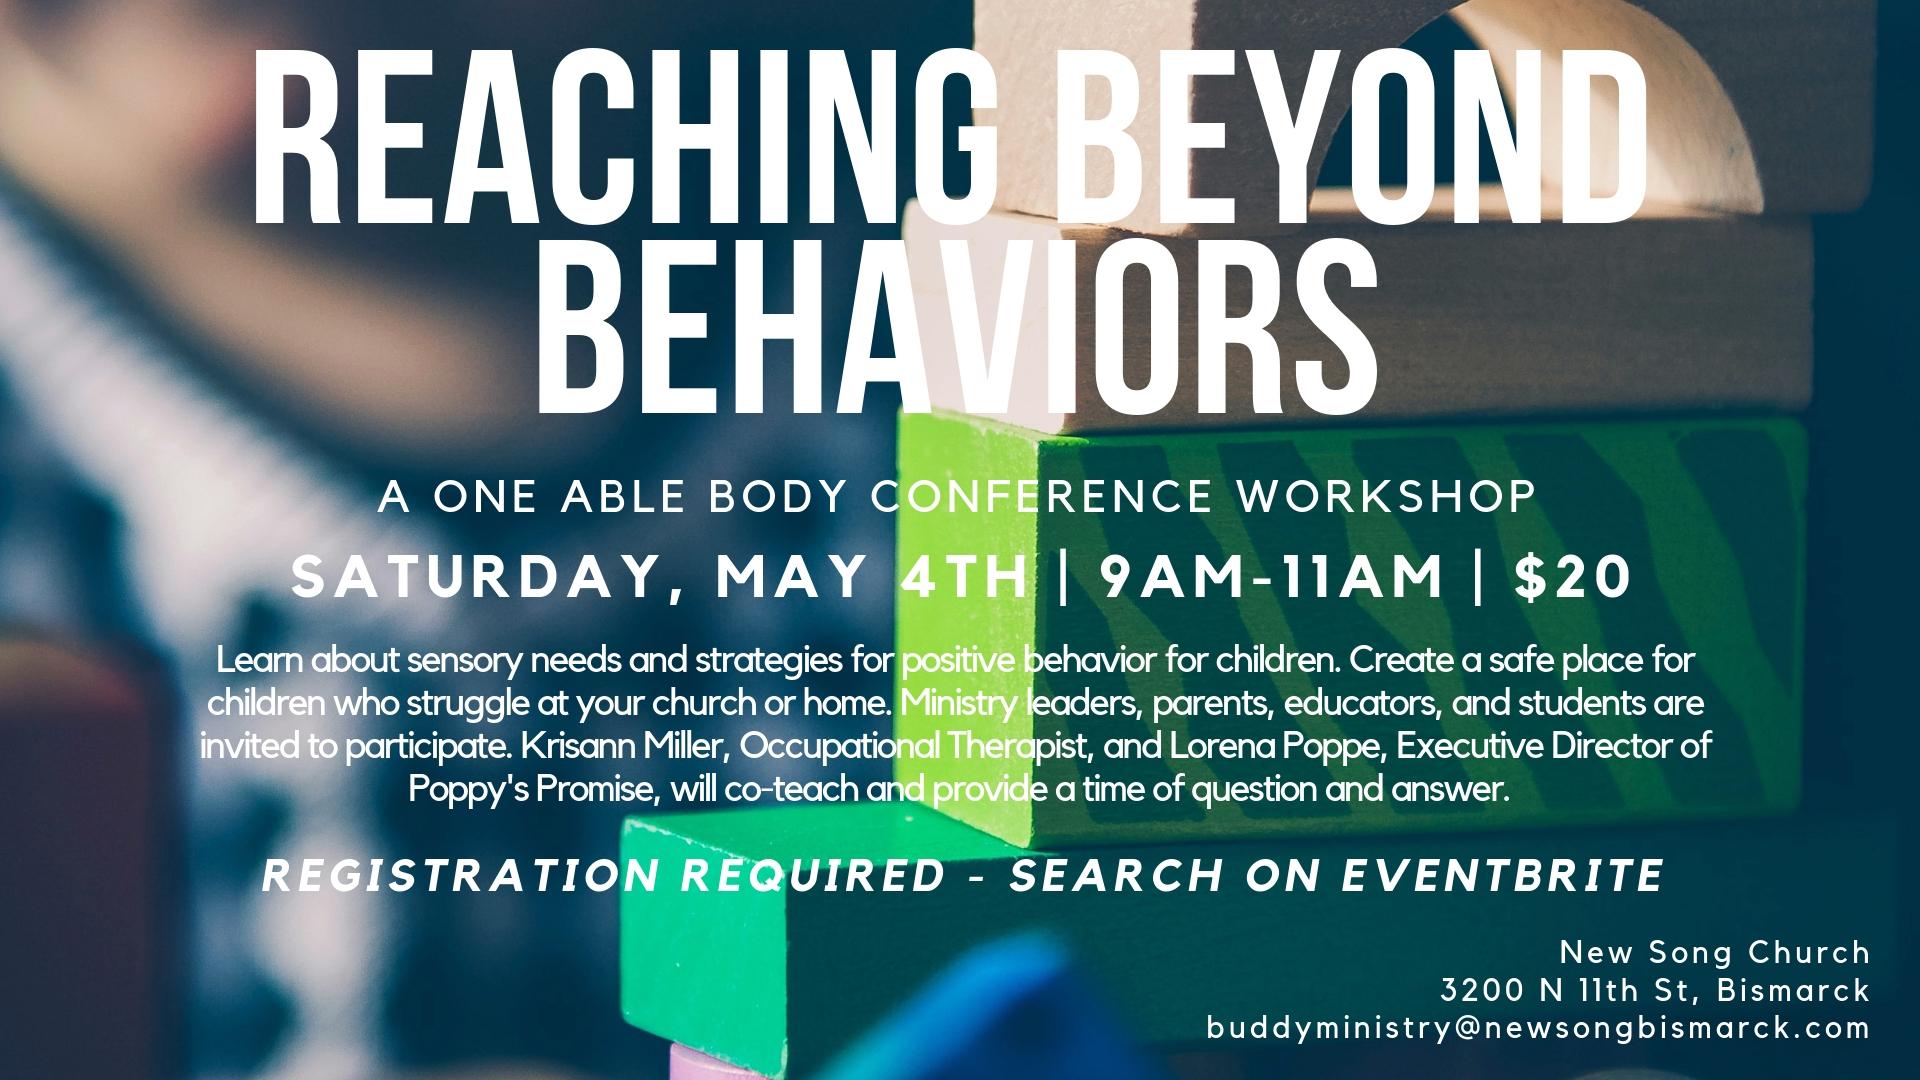 Reaching Beyond Behaviors OAB slide [5.4.19].jpg